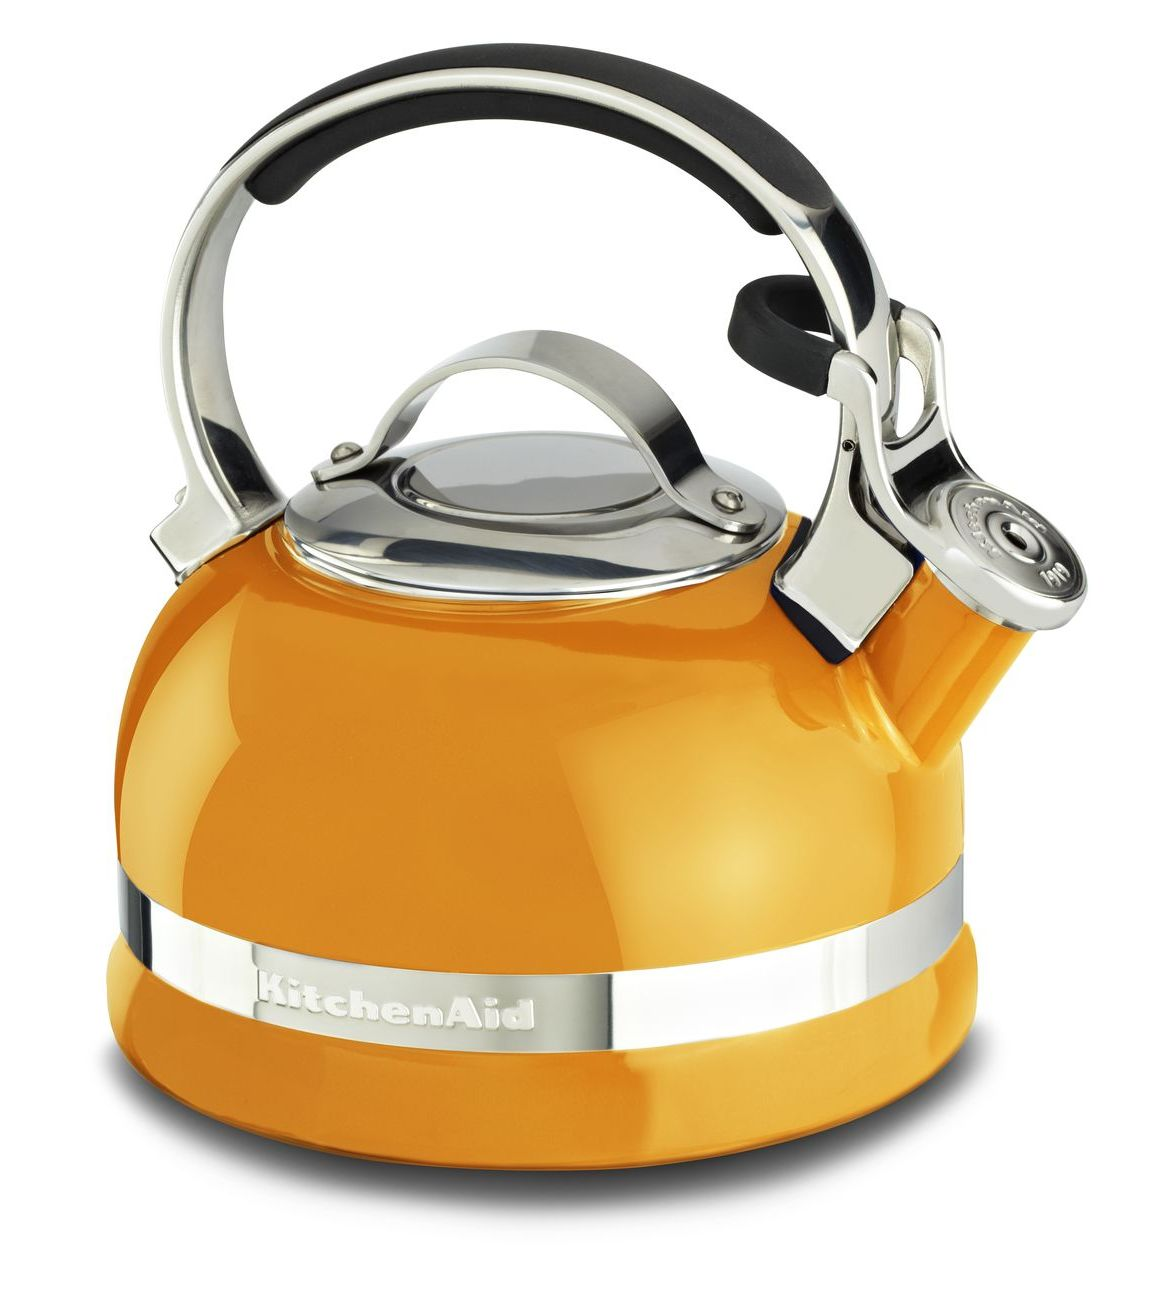 KitchenAid 2.0 Qt. Tea Kettle with Trim Band